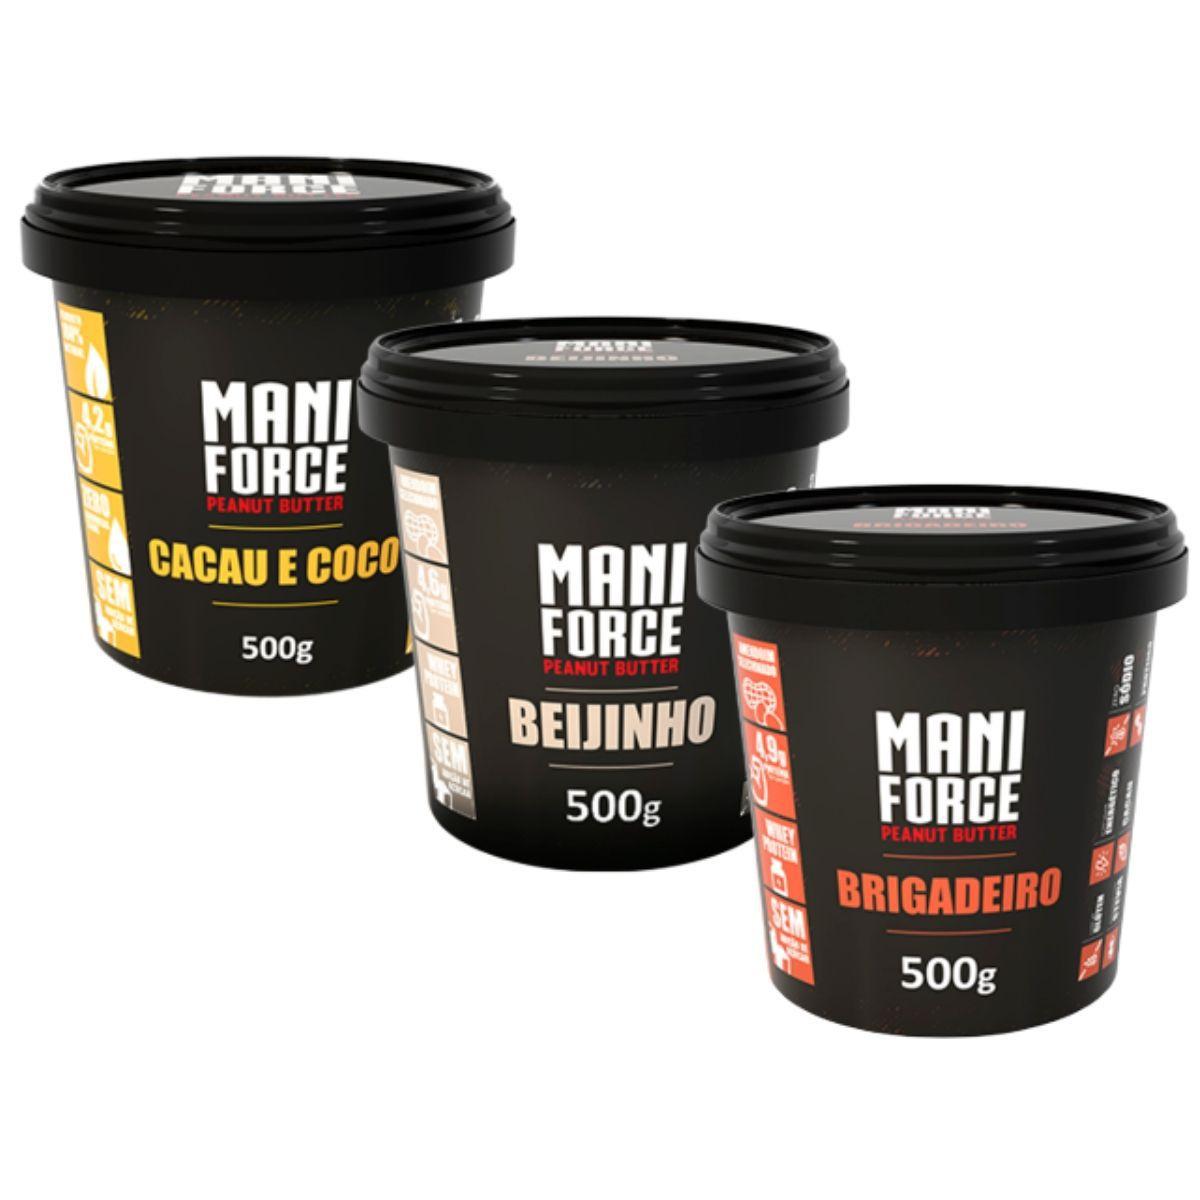 Pasta De Amendoim Maniforce 500g - Manibi